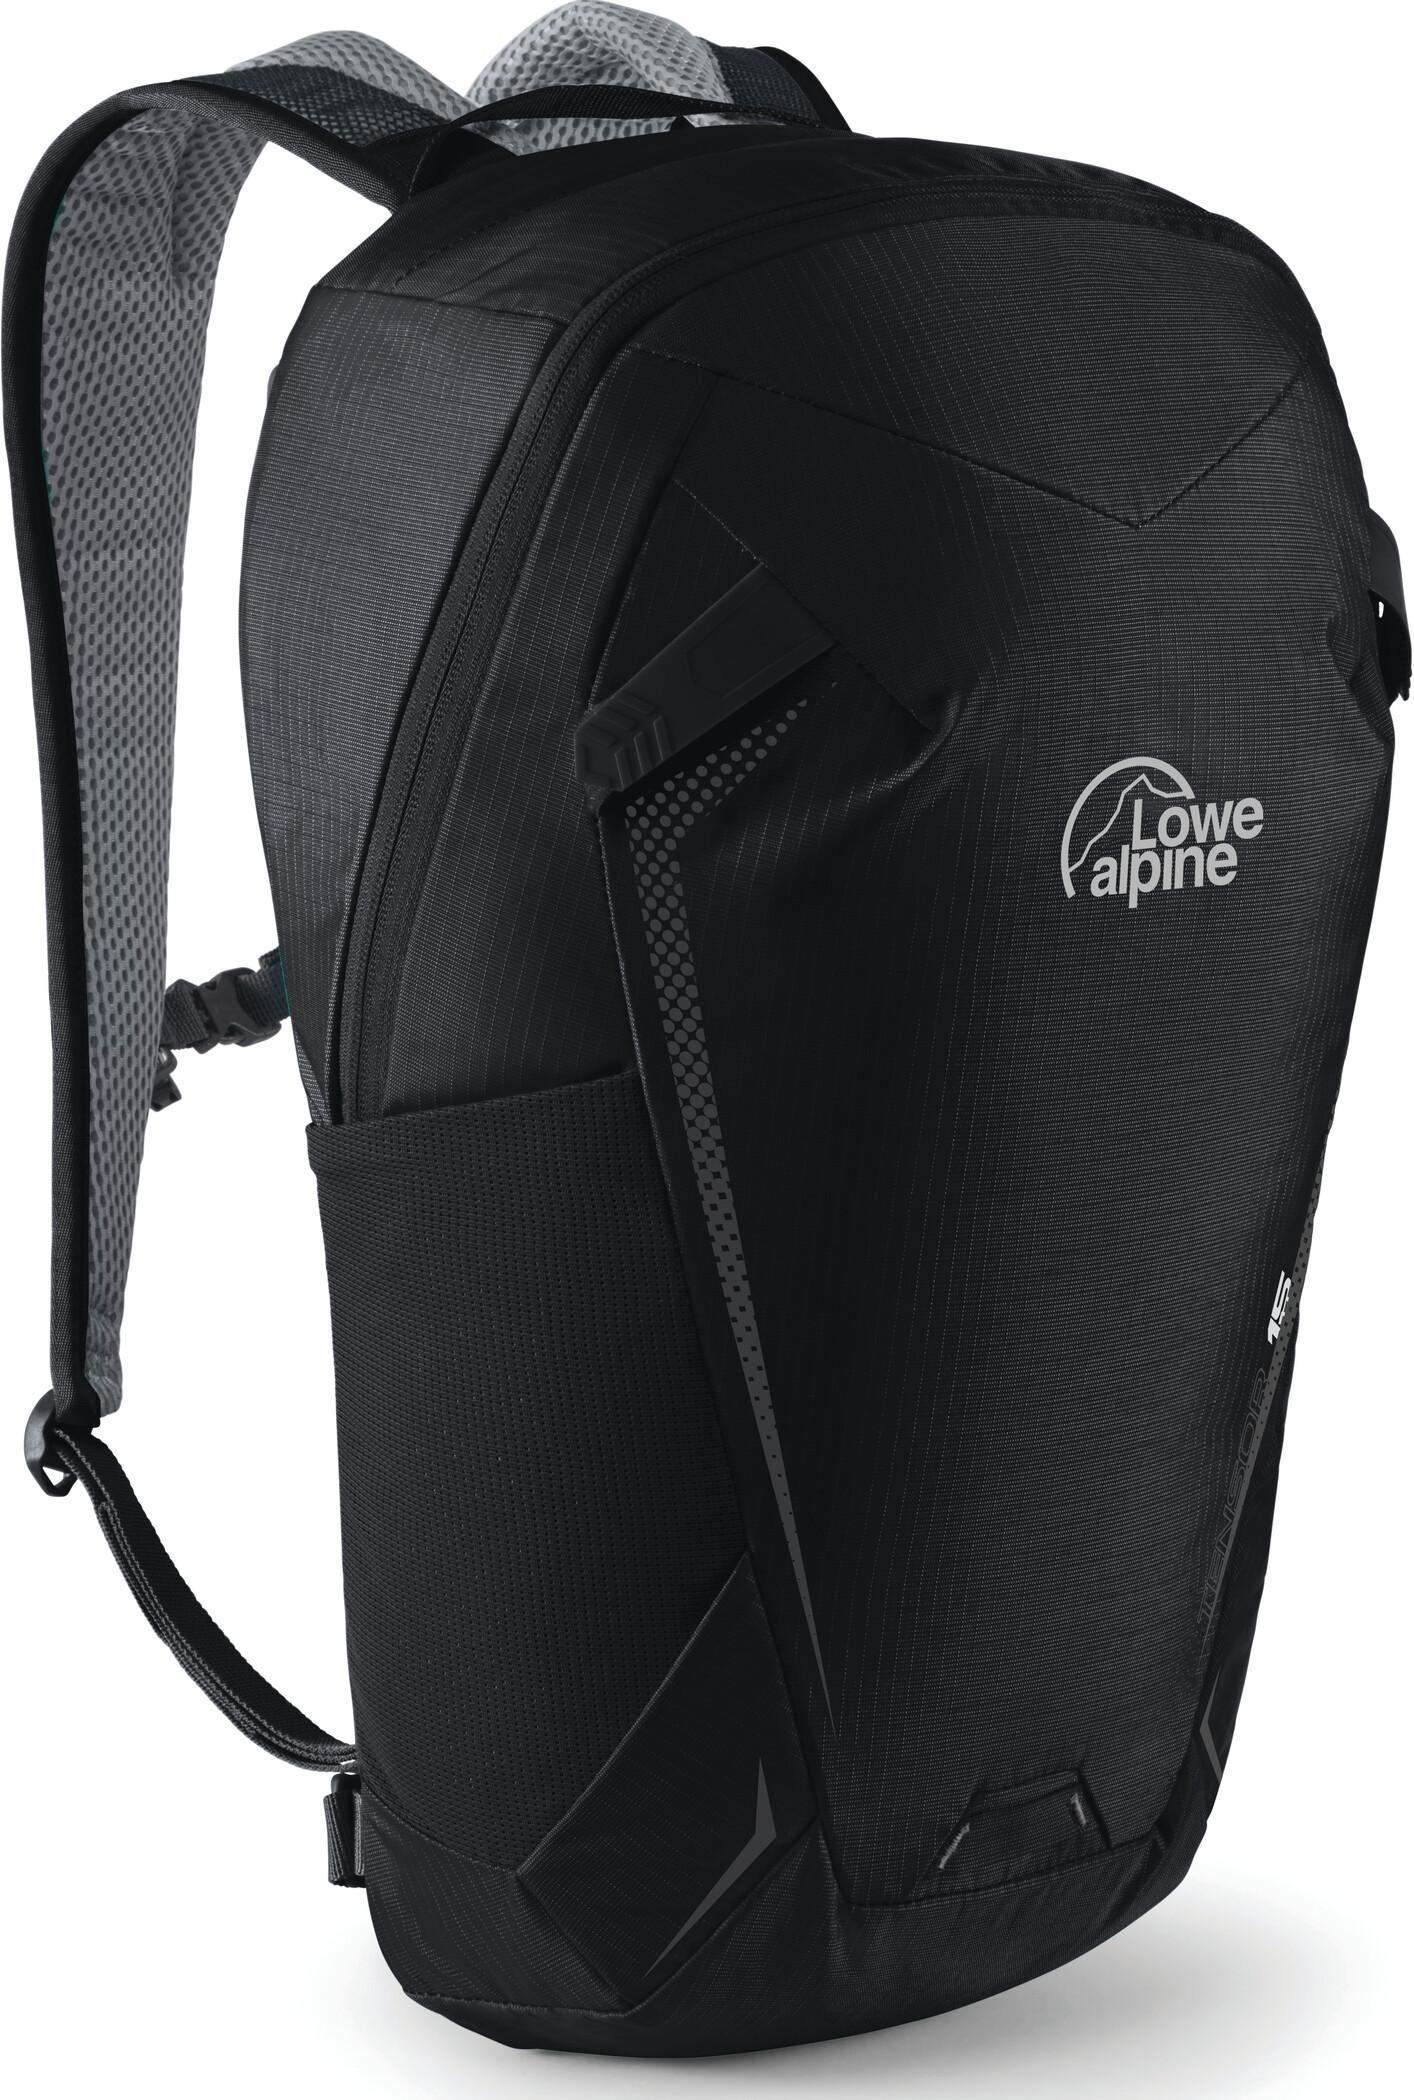 Lowe Alpine Tensor Backpack 16L, black (2019)   Travel bags